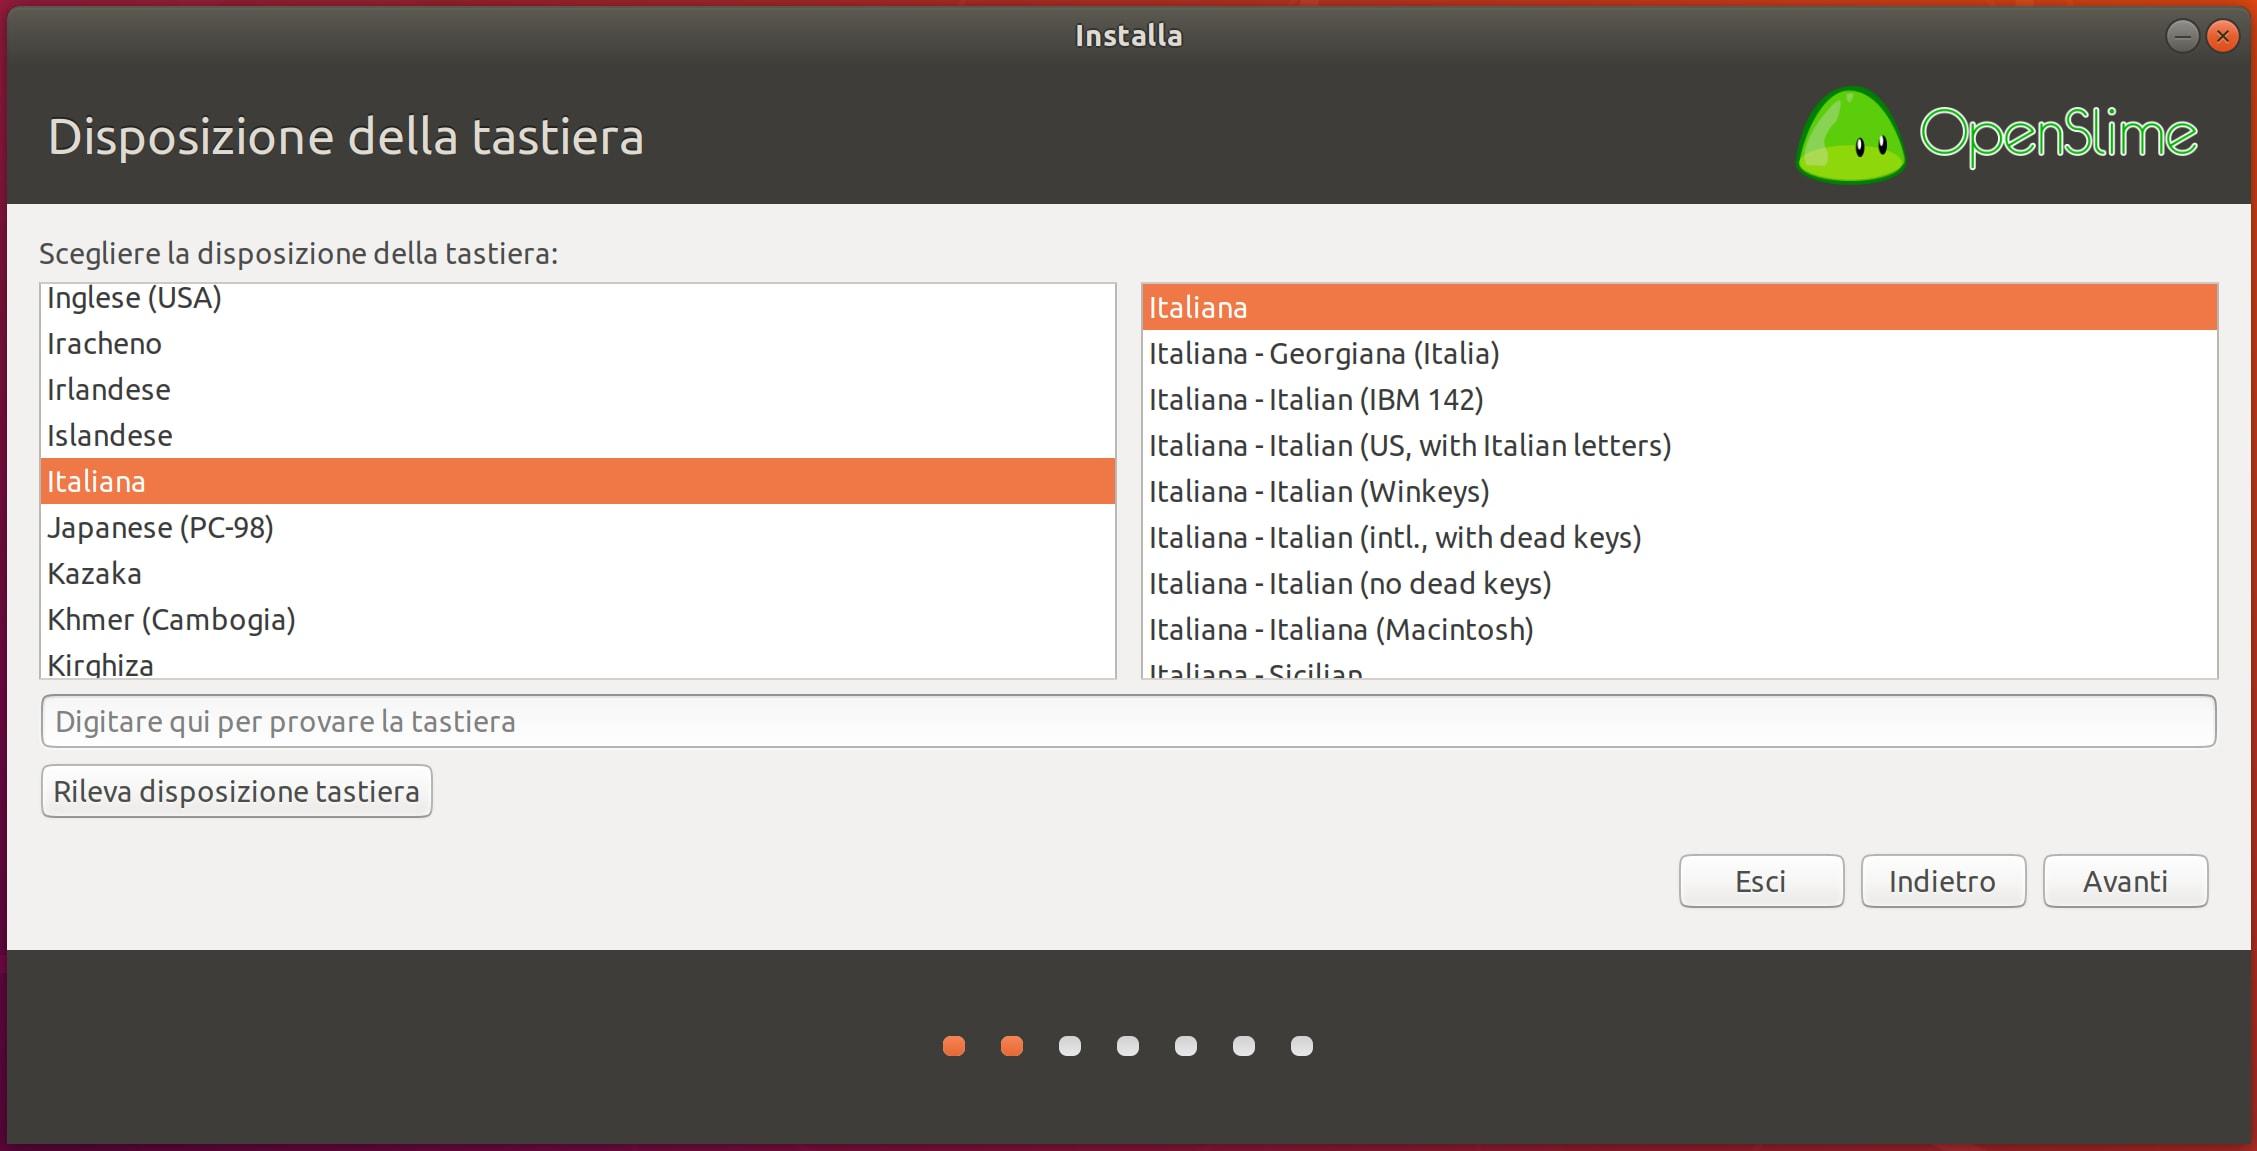 installer-2 - Recensione Ubuntu 18.04.1 LTS Bionic Beaver